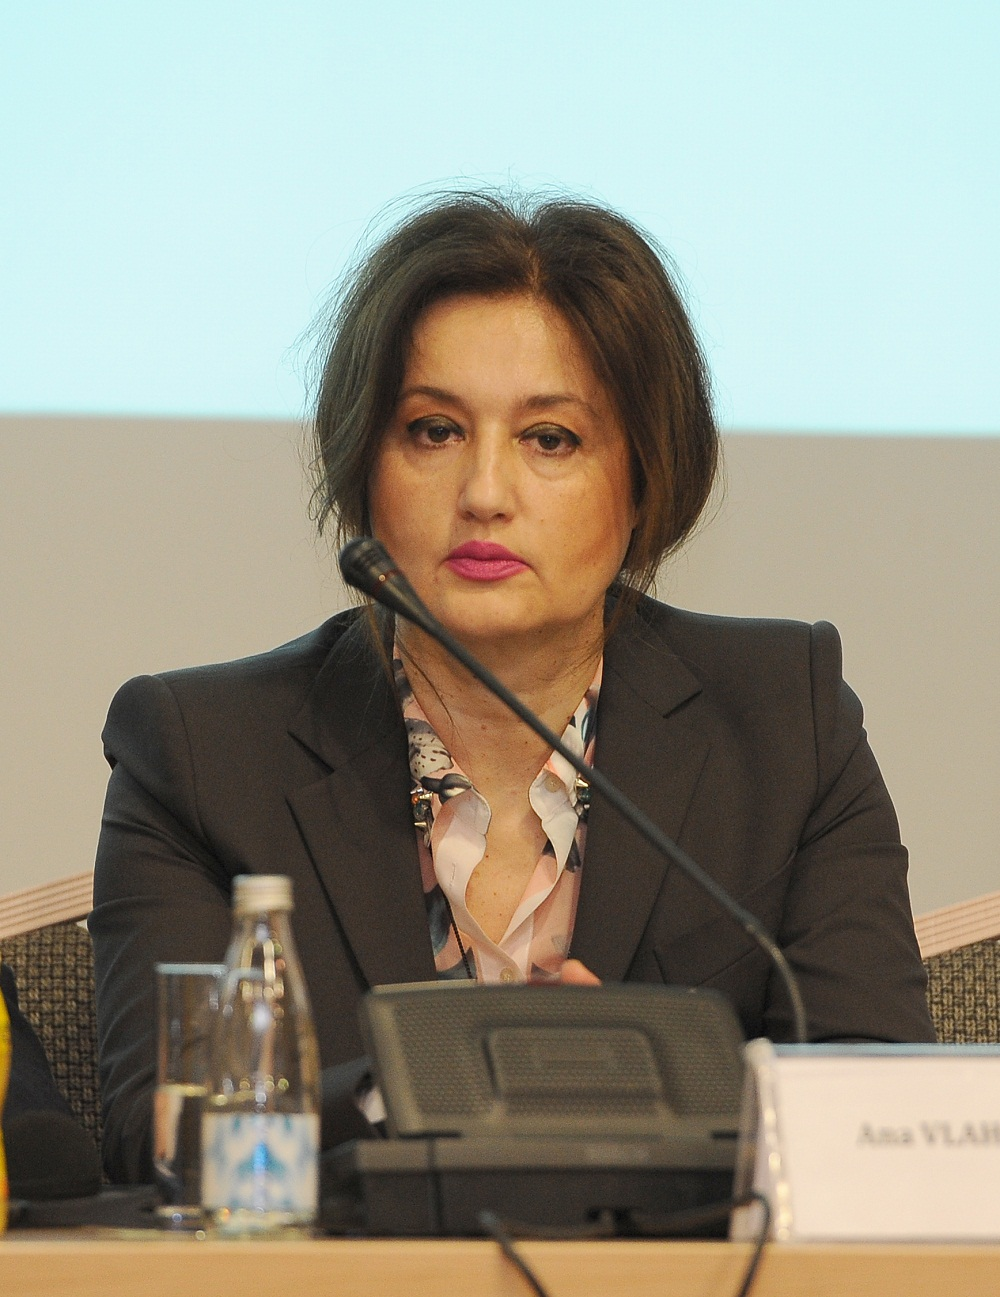 Ana Vlahović